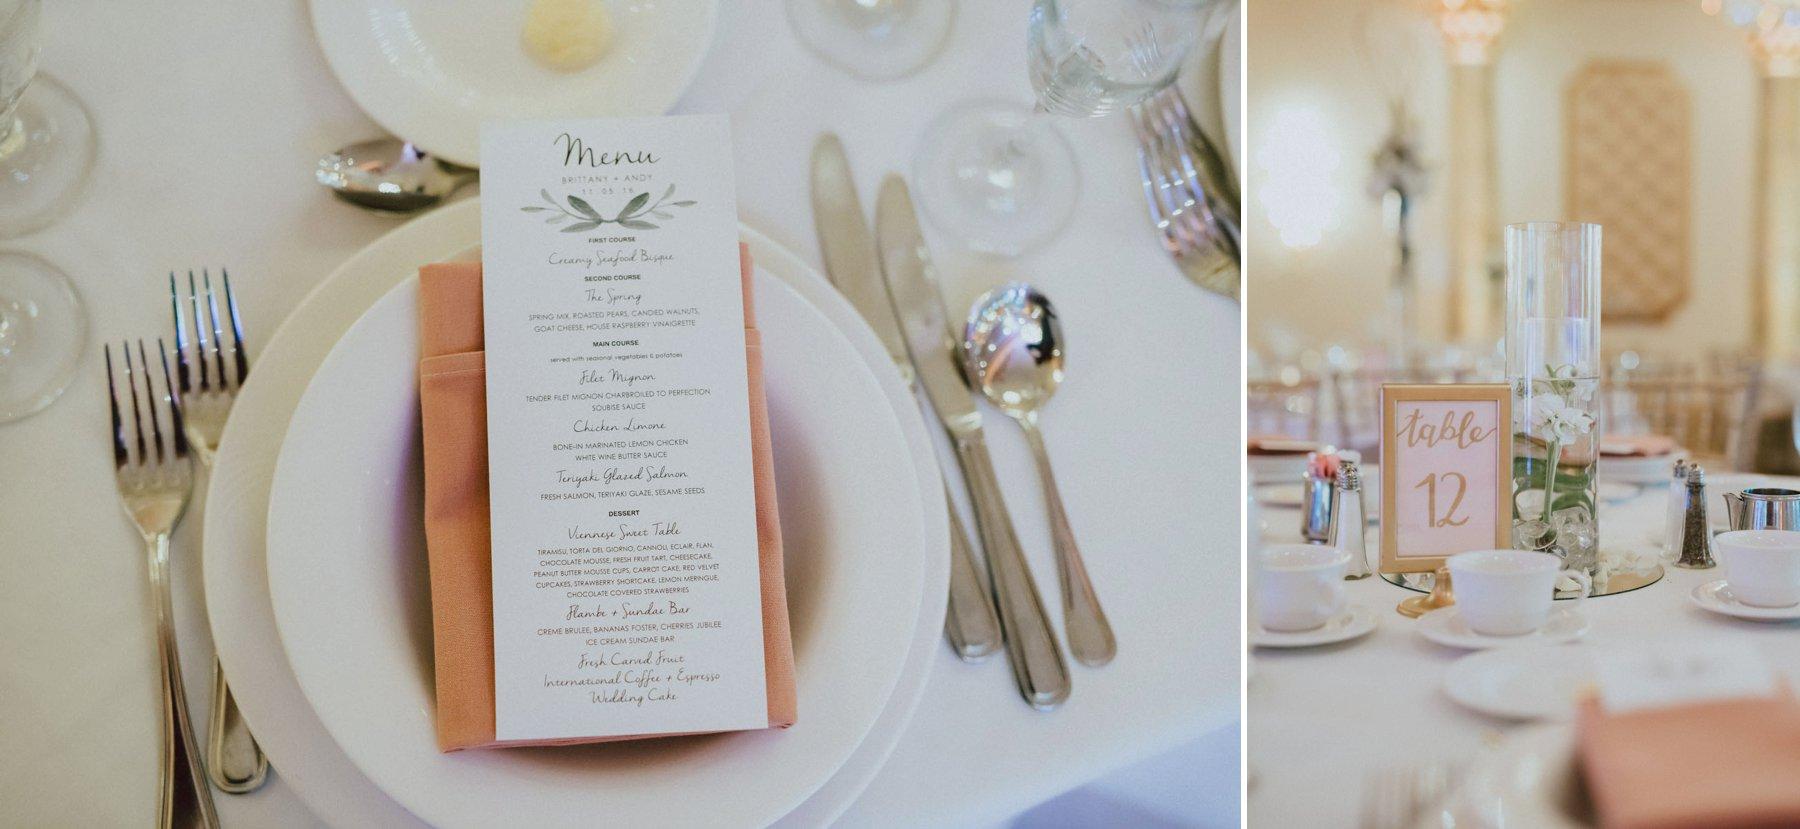 philadelphia-wedding-photographer-133.jpg